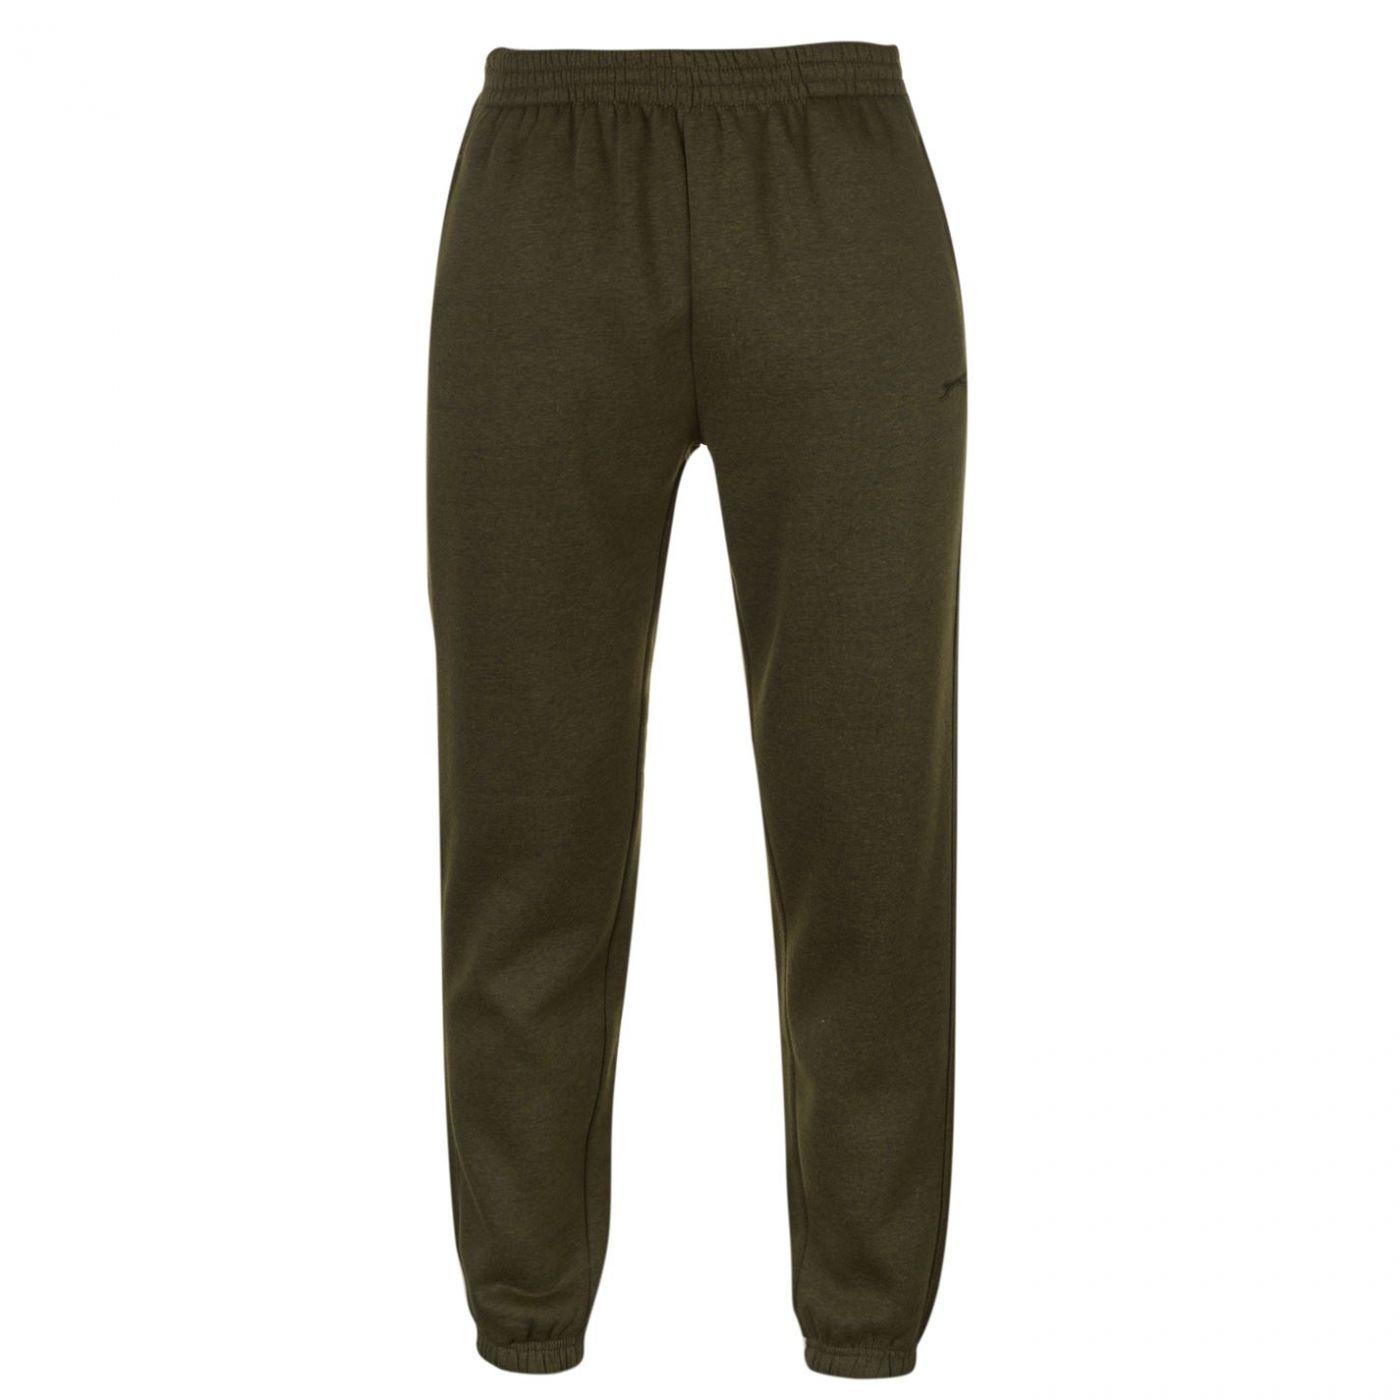 Slazenger Cuffed Fleece Jogging Pants Mens